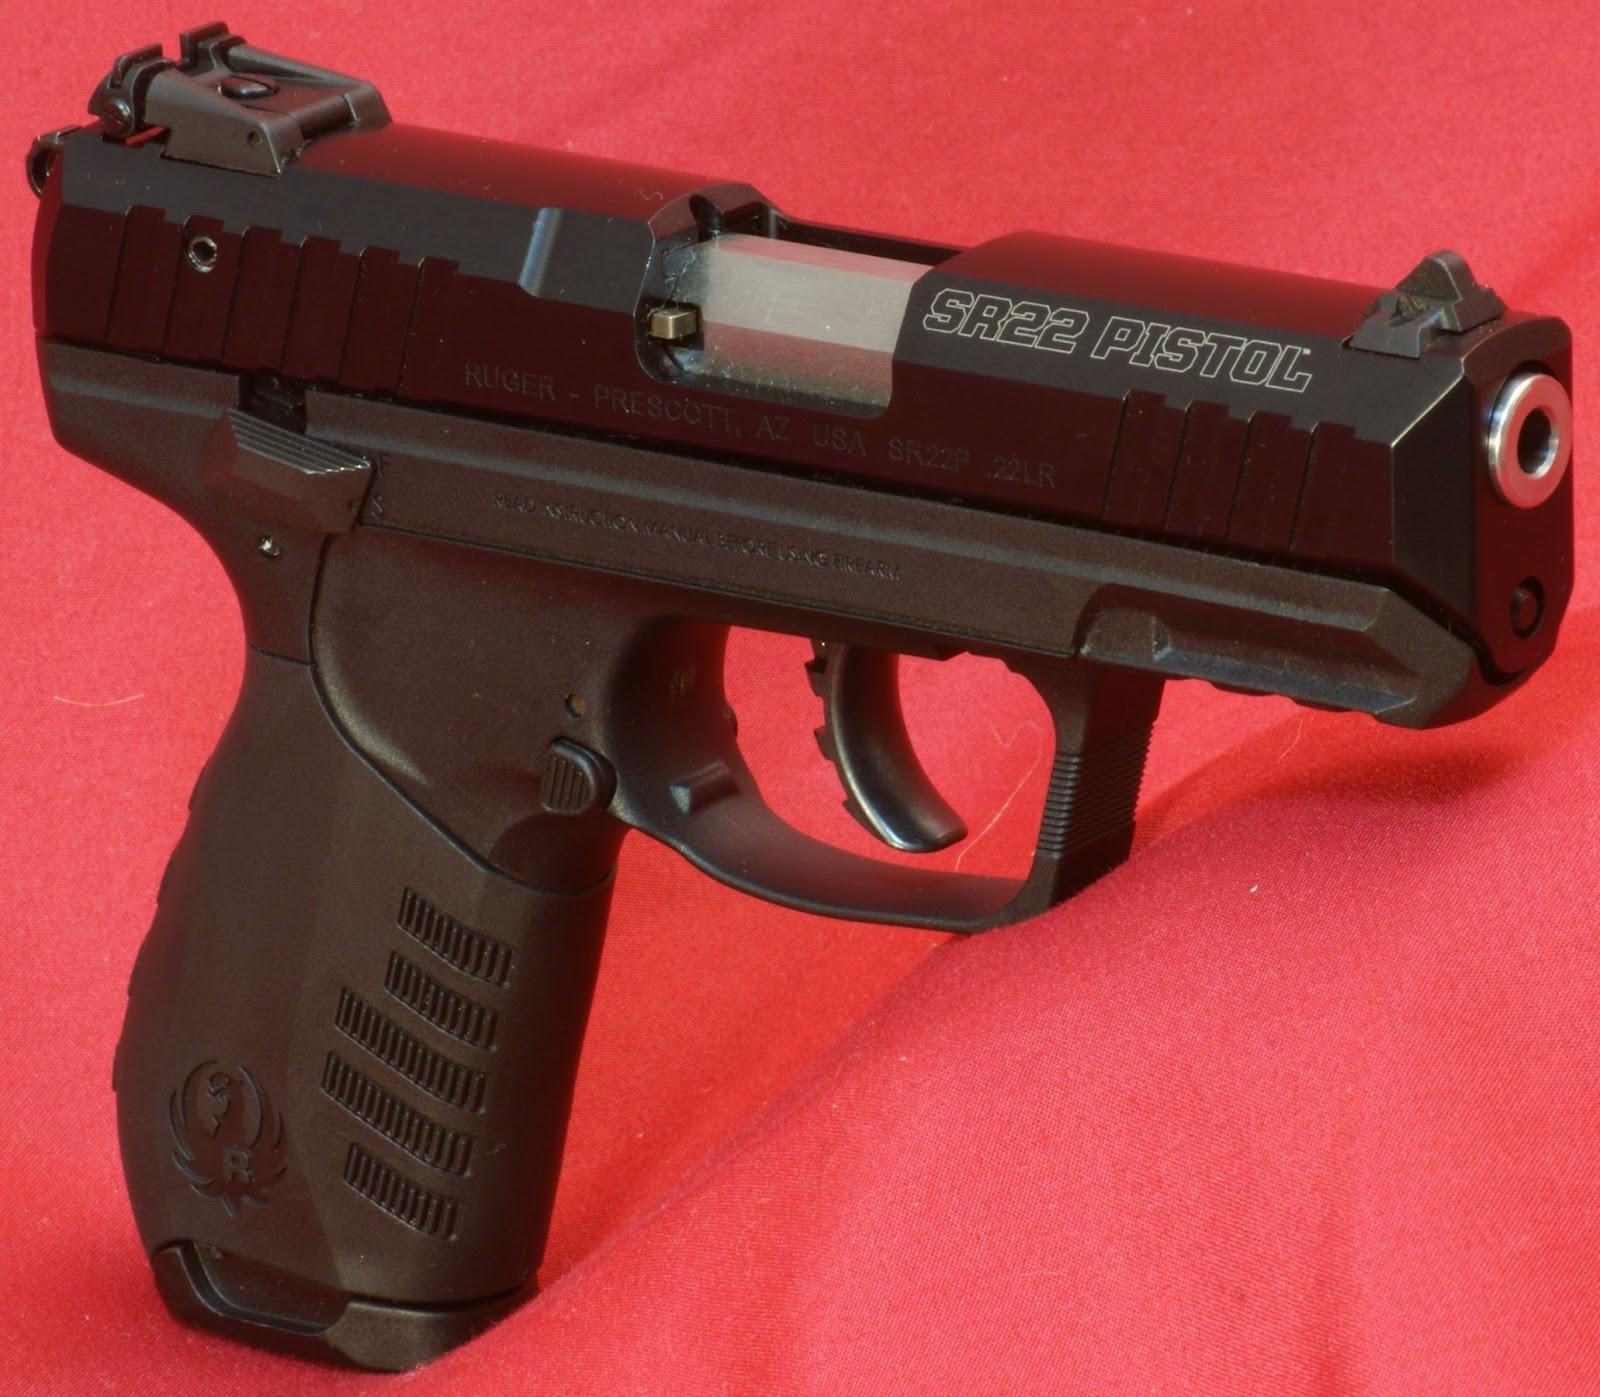 Gunsumer Reports Ruger Sr22 Pistol Review Reader S Comments